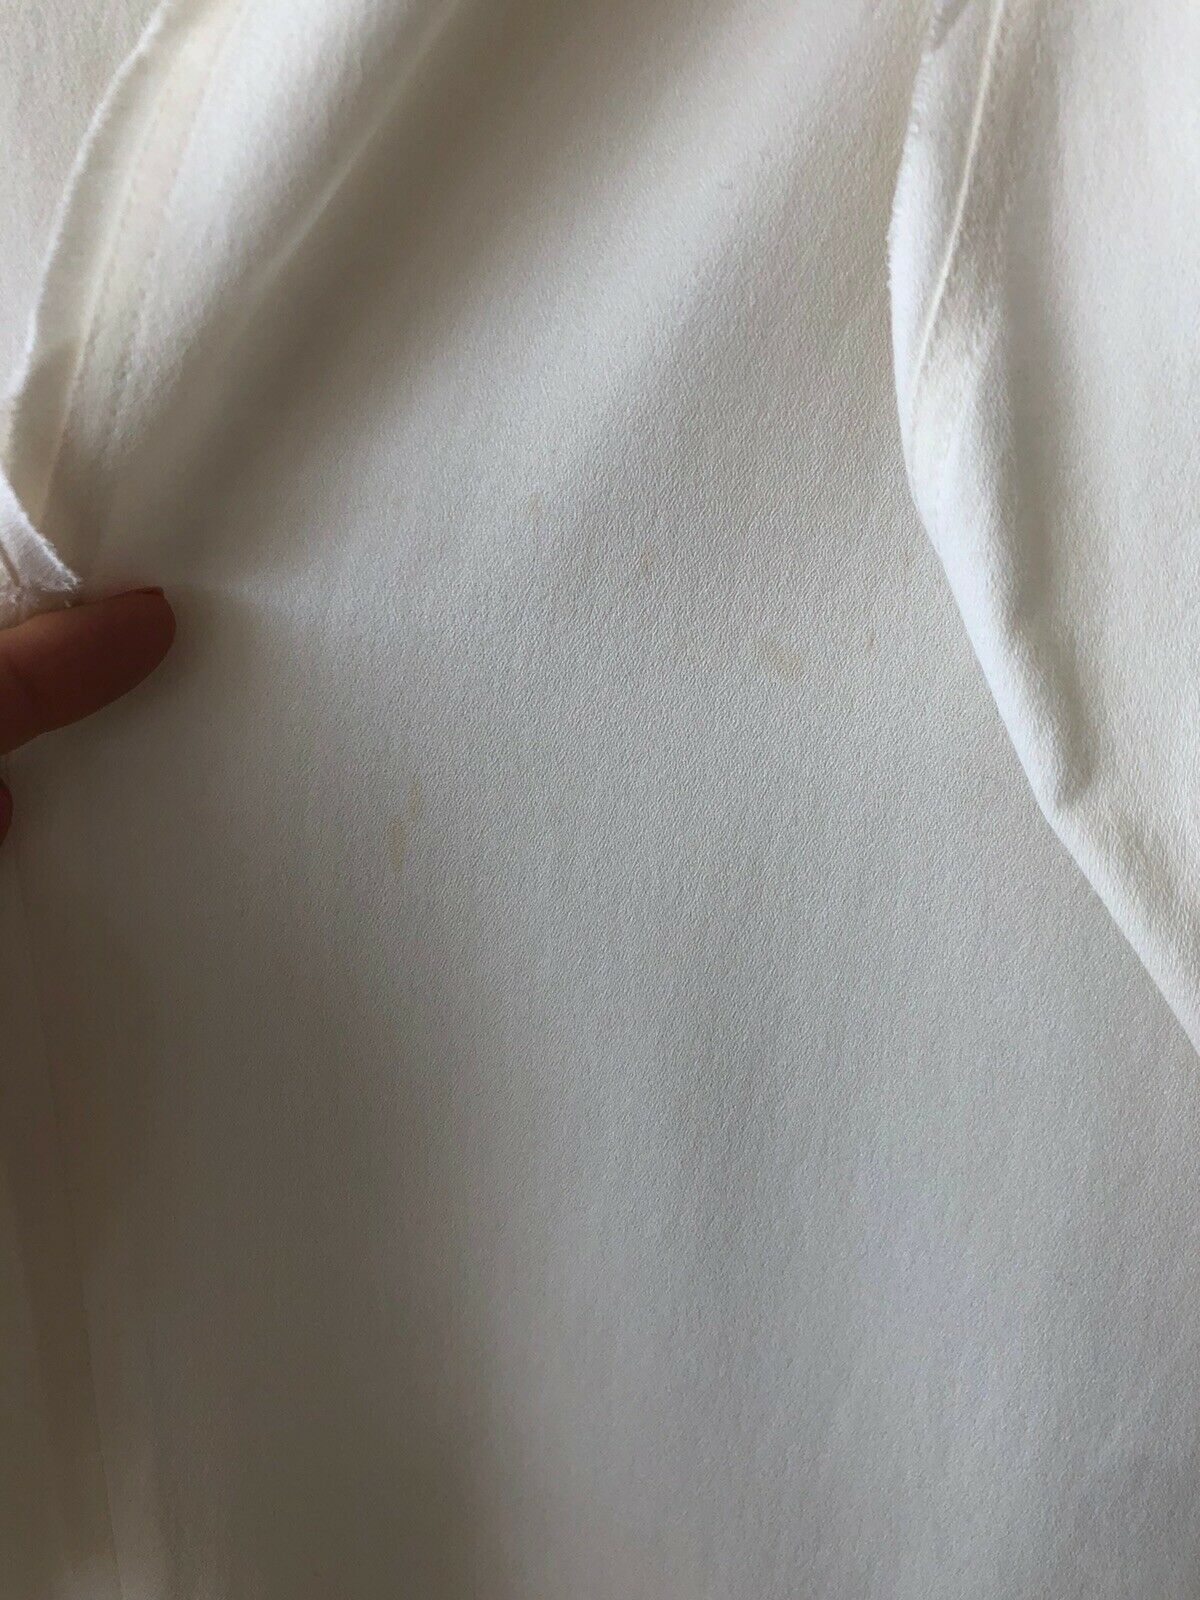 FENDI Silk Ruffle White Ivory Top Blouse SZ 44 - image 11